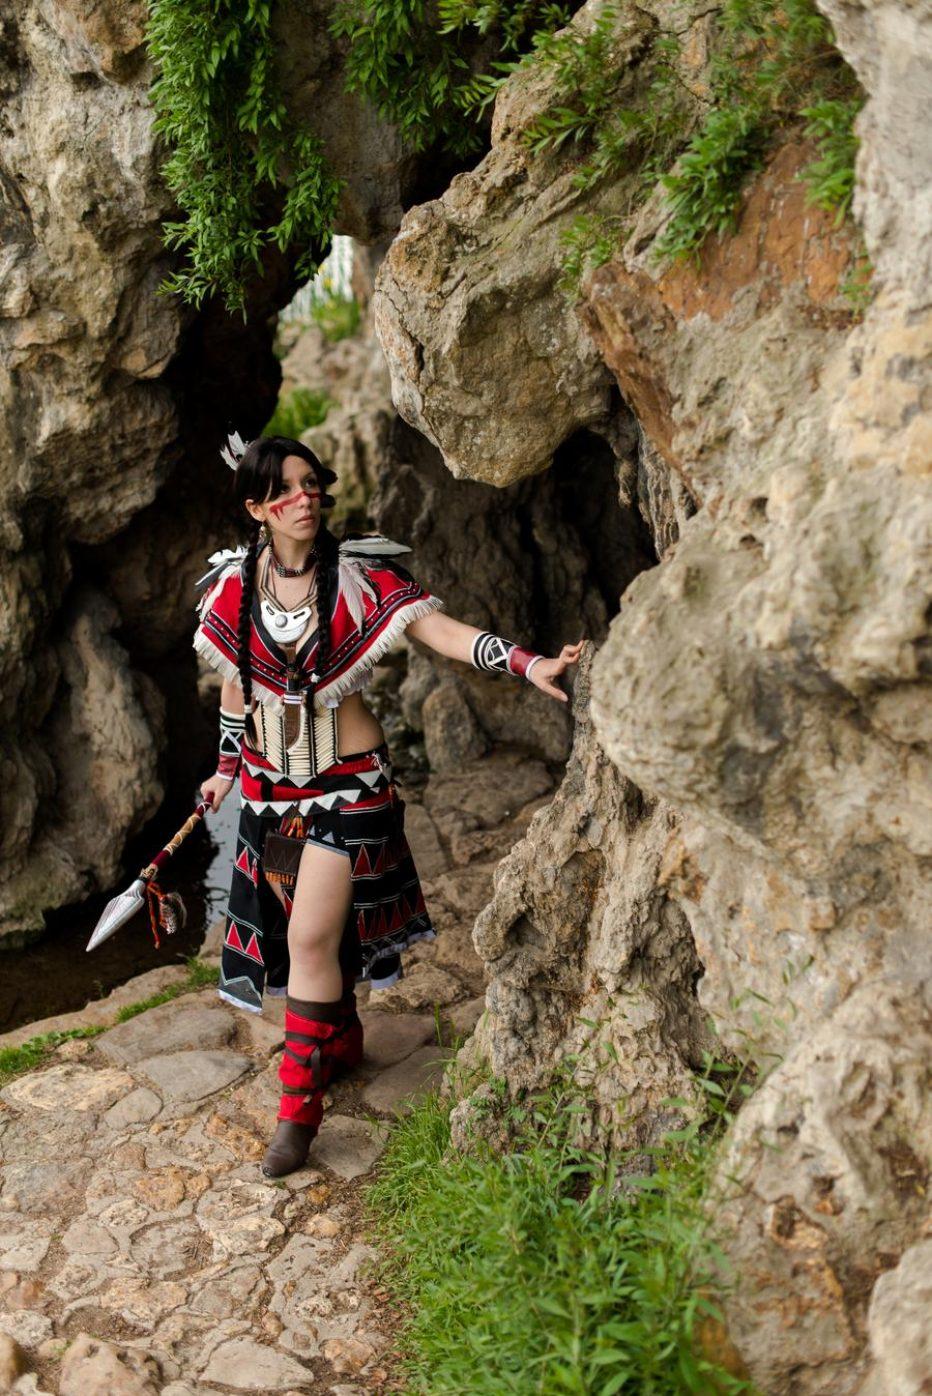 Assassins-Creed-IIIs-Alsoomse-Cosplay-Gamers-Heroes-3.jpg